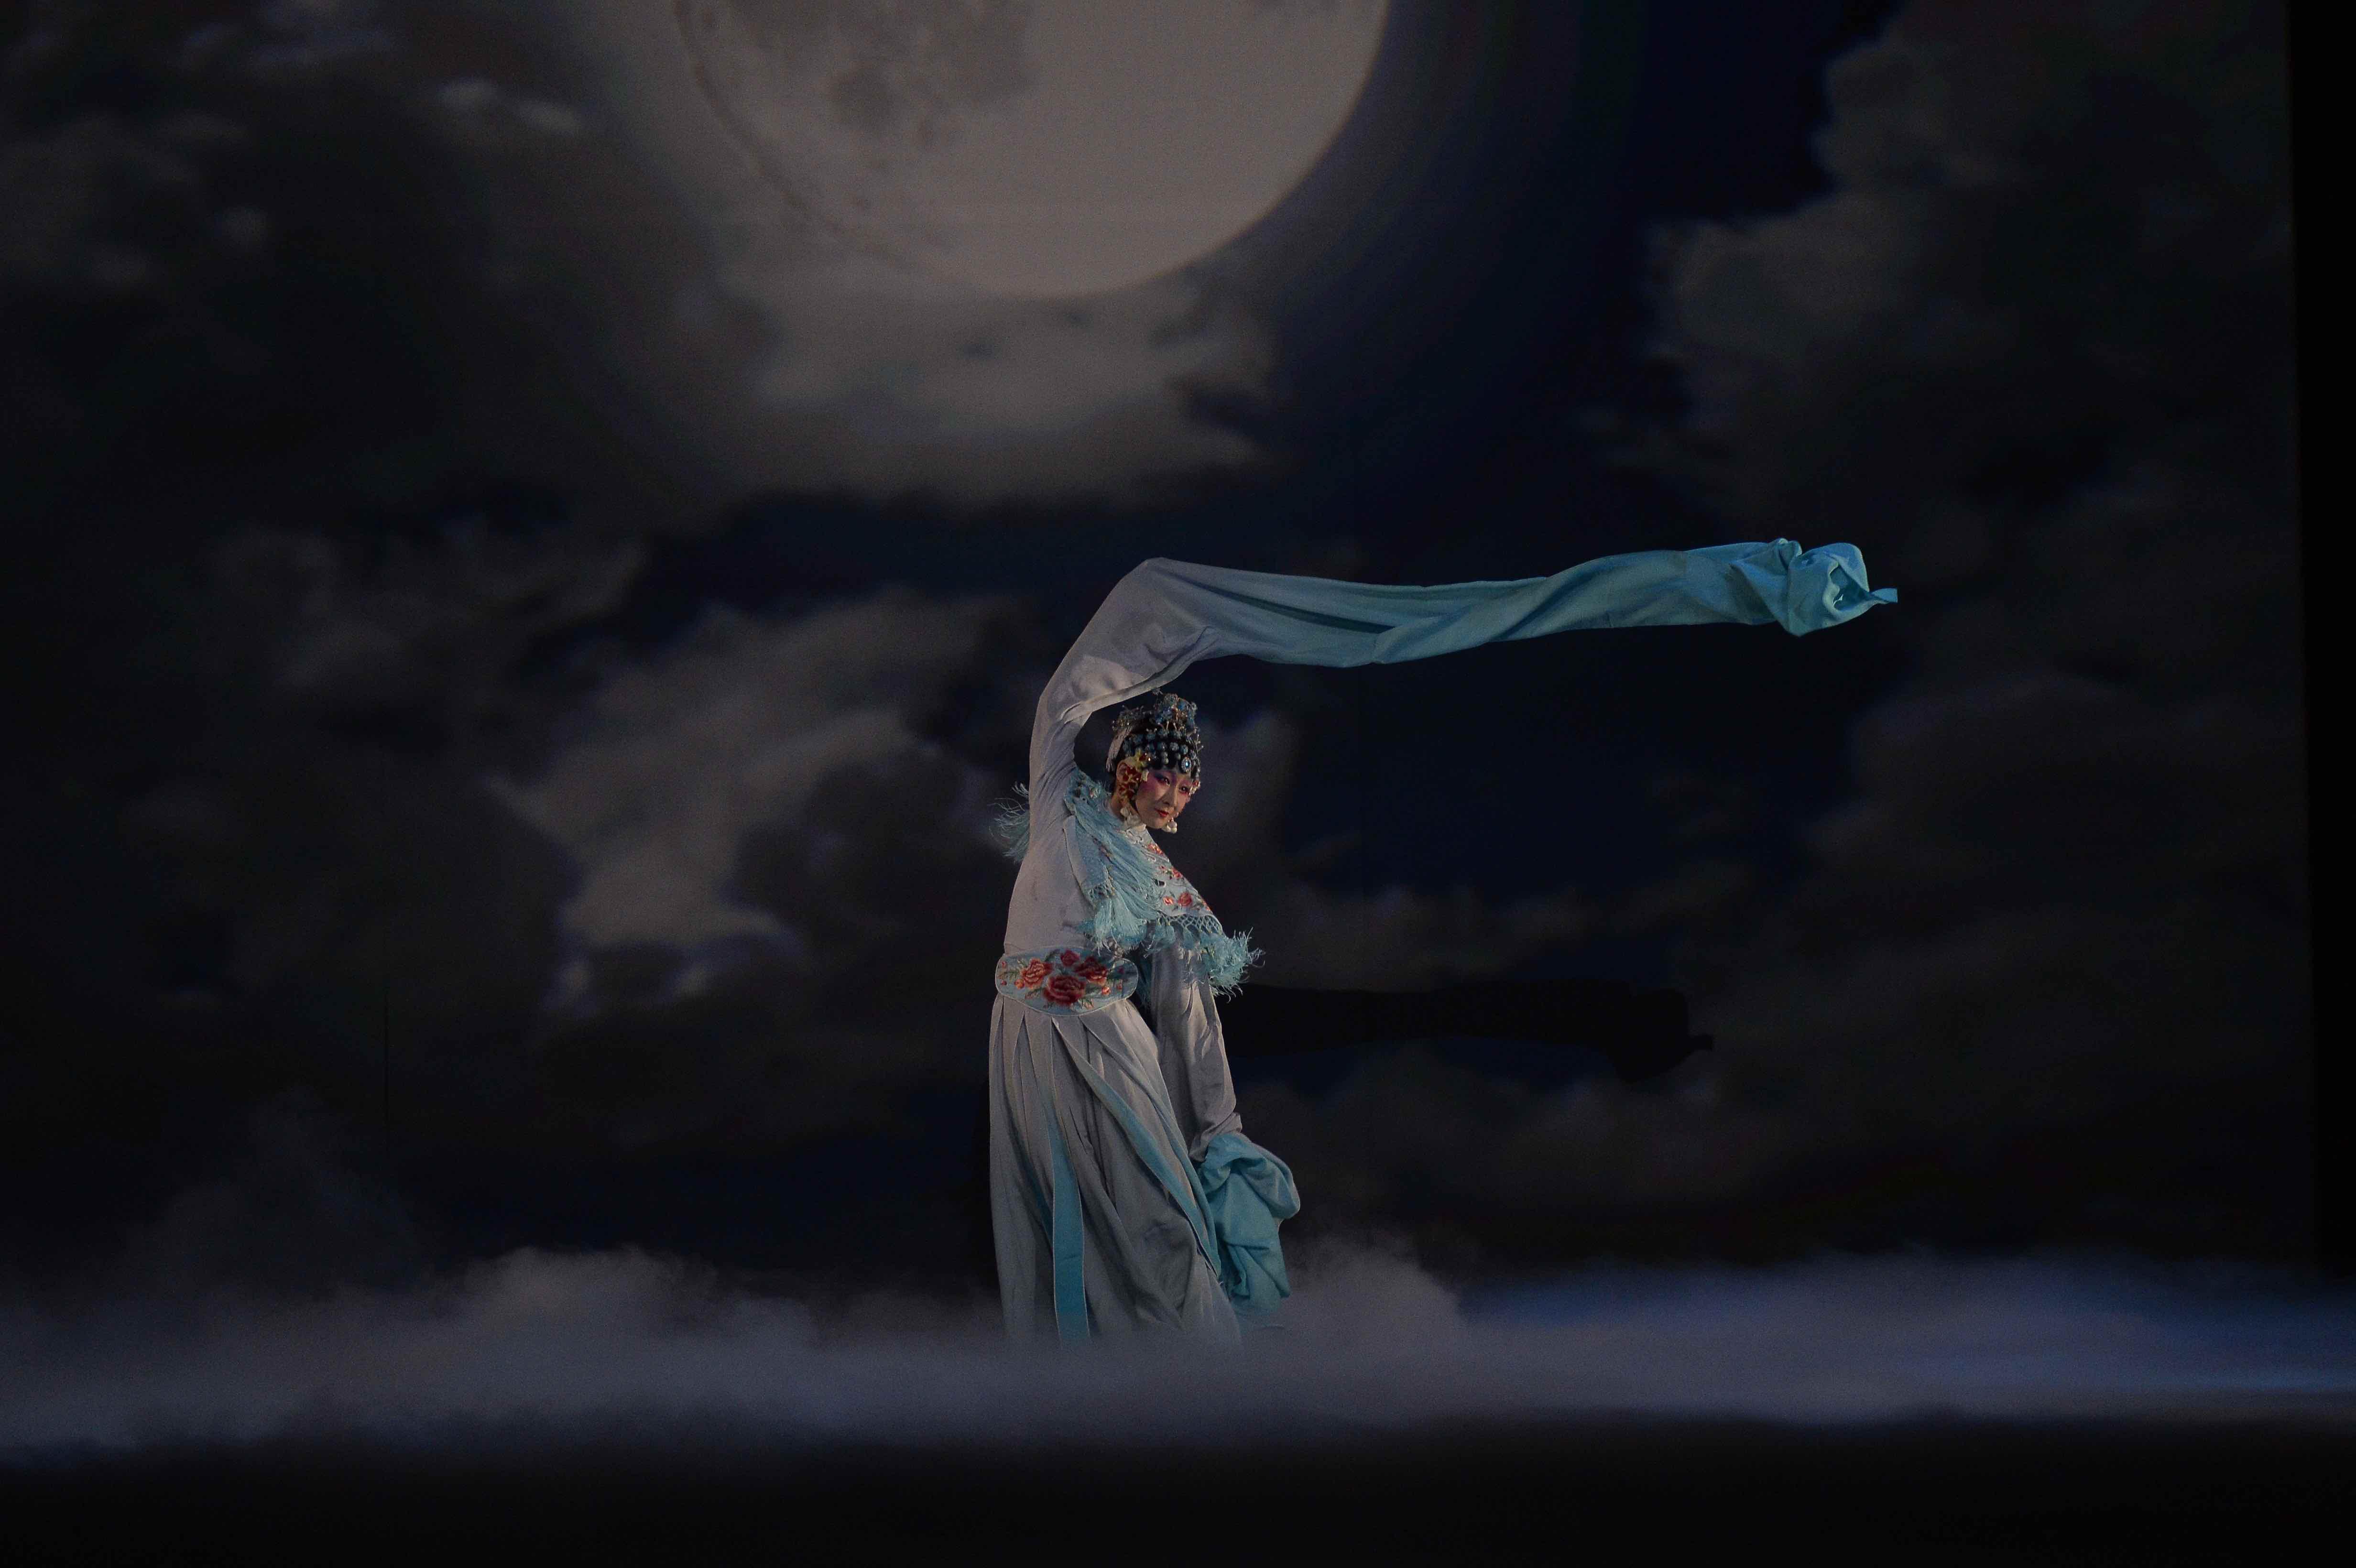 16_04_18_19_the_moon_opera_c_wang_ning_002.jpg